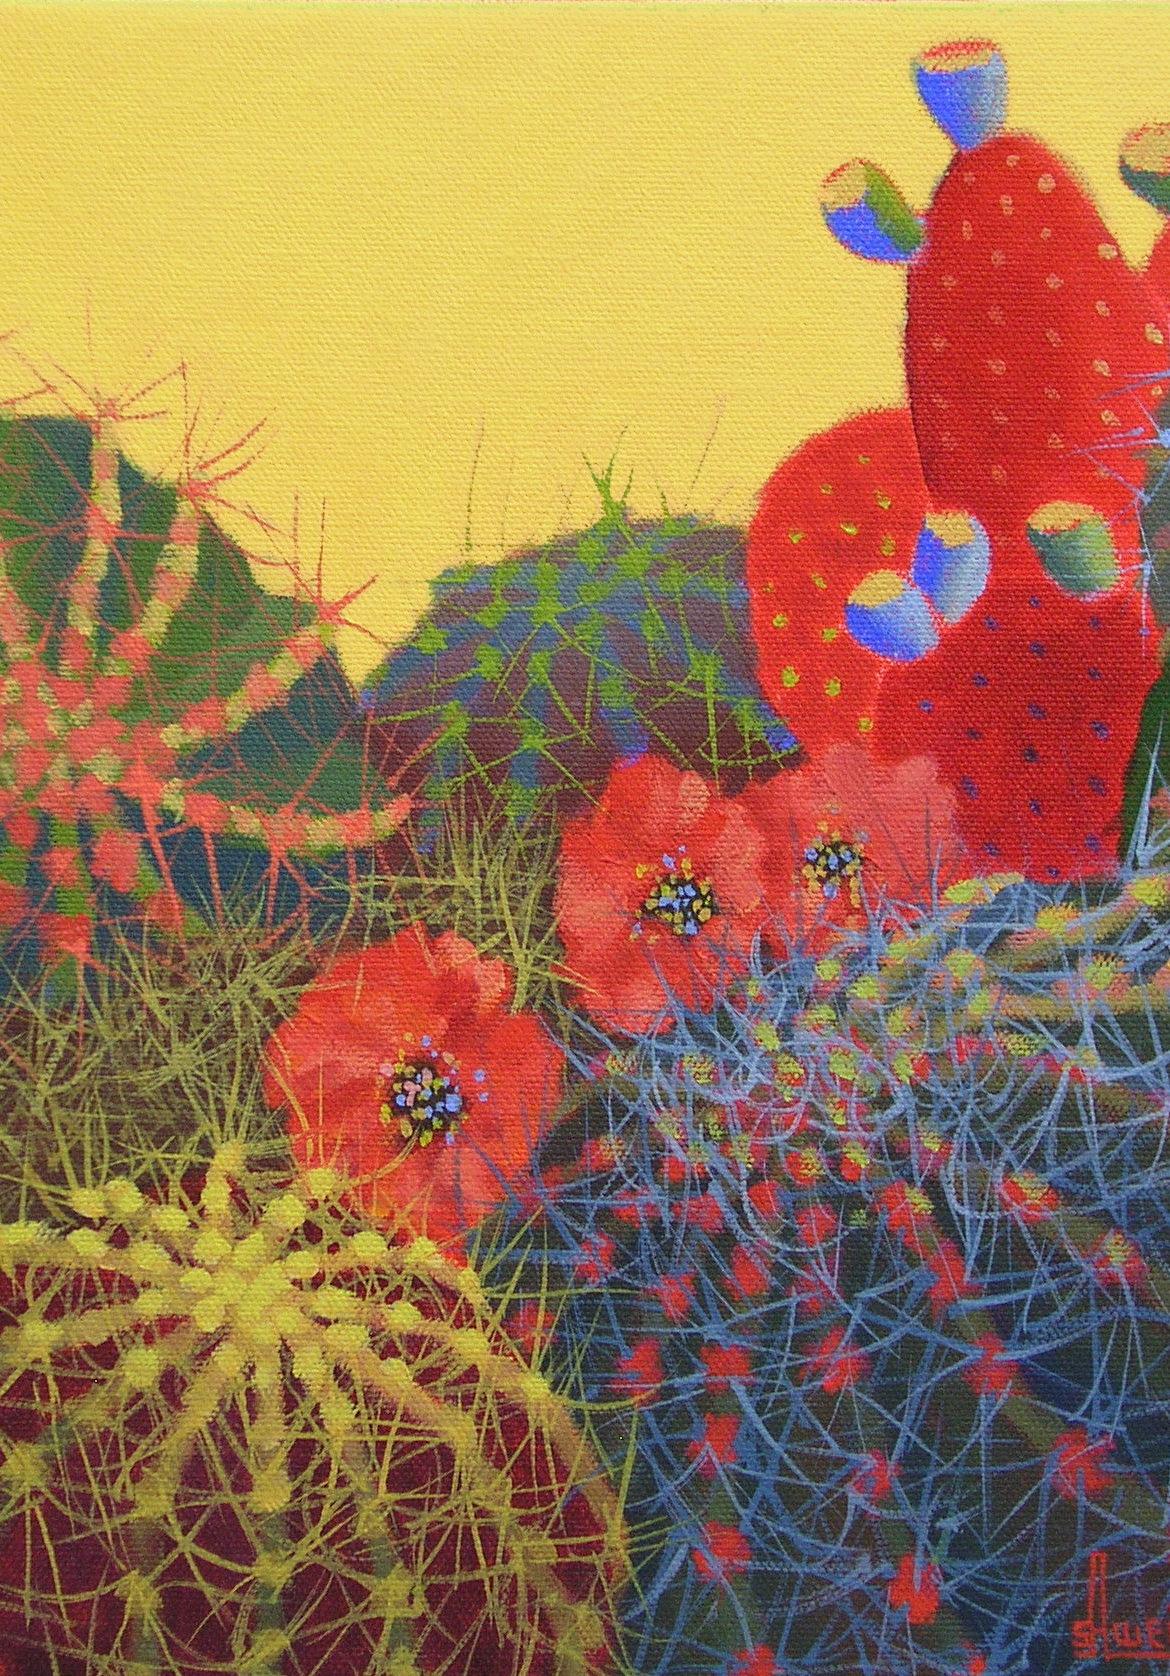 Desert Blooms #34, Sharon Weiser, Rogoway Gallery